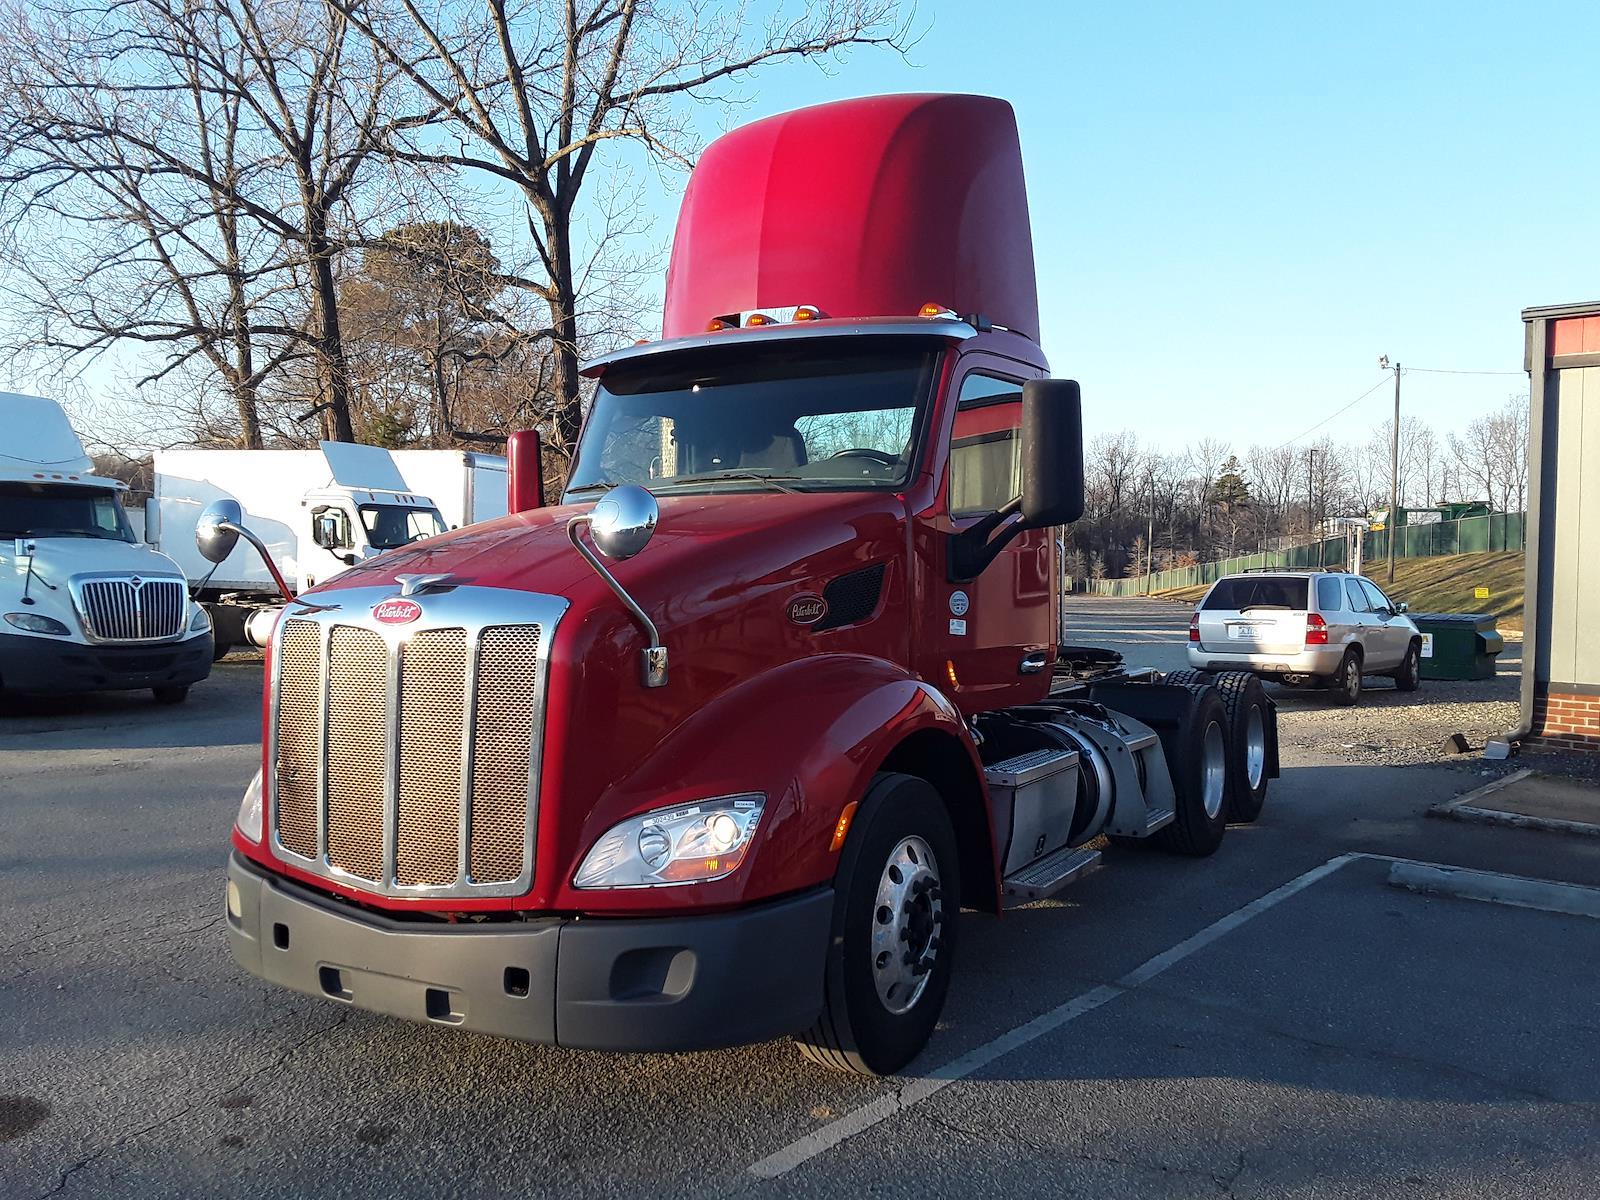 2015 Peterbilt 579 6x4, Tractor #302439 - photo 1